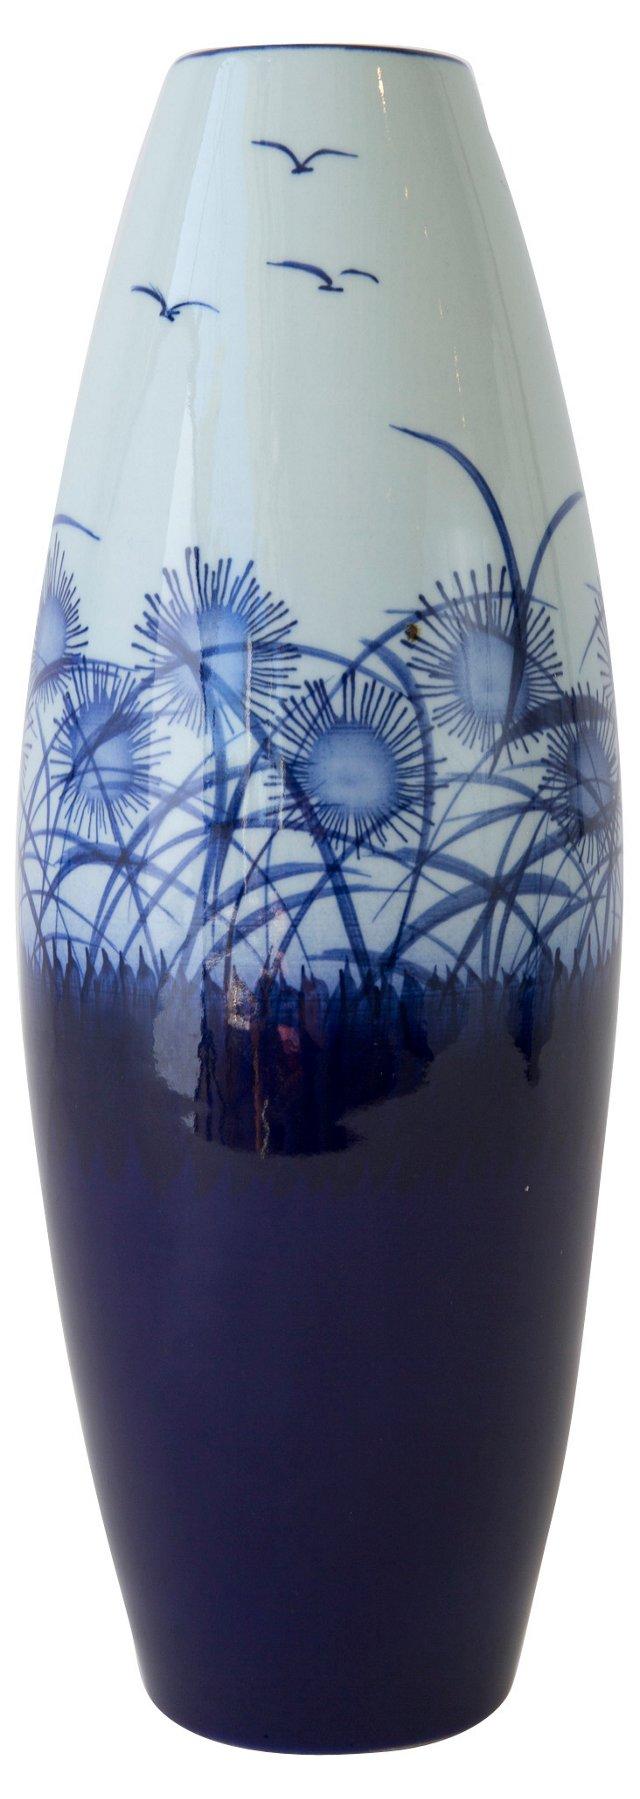 Modern Blue & White Chinese Vase